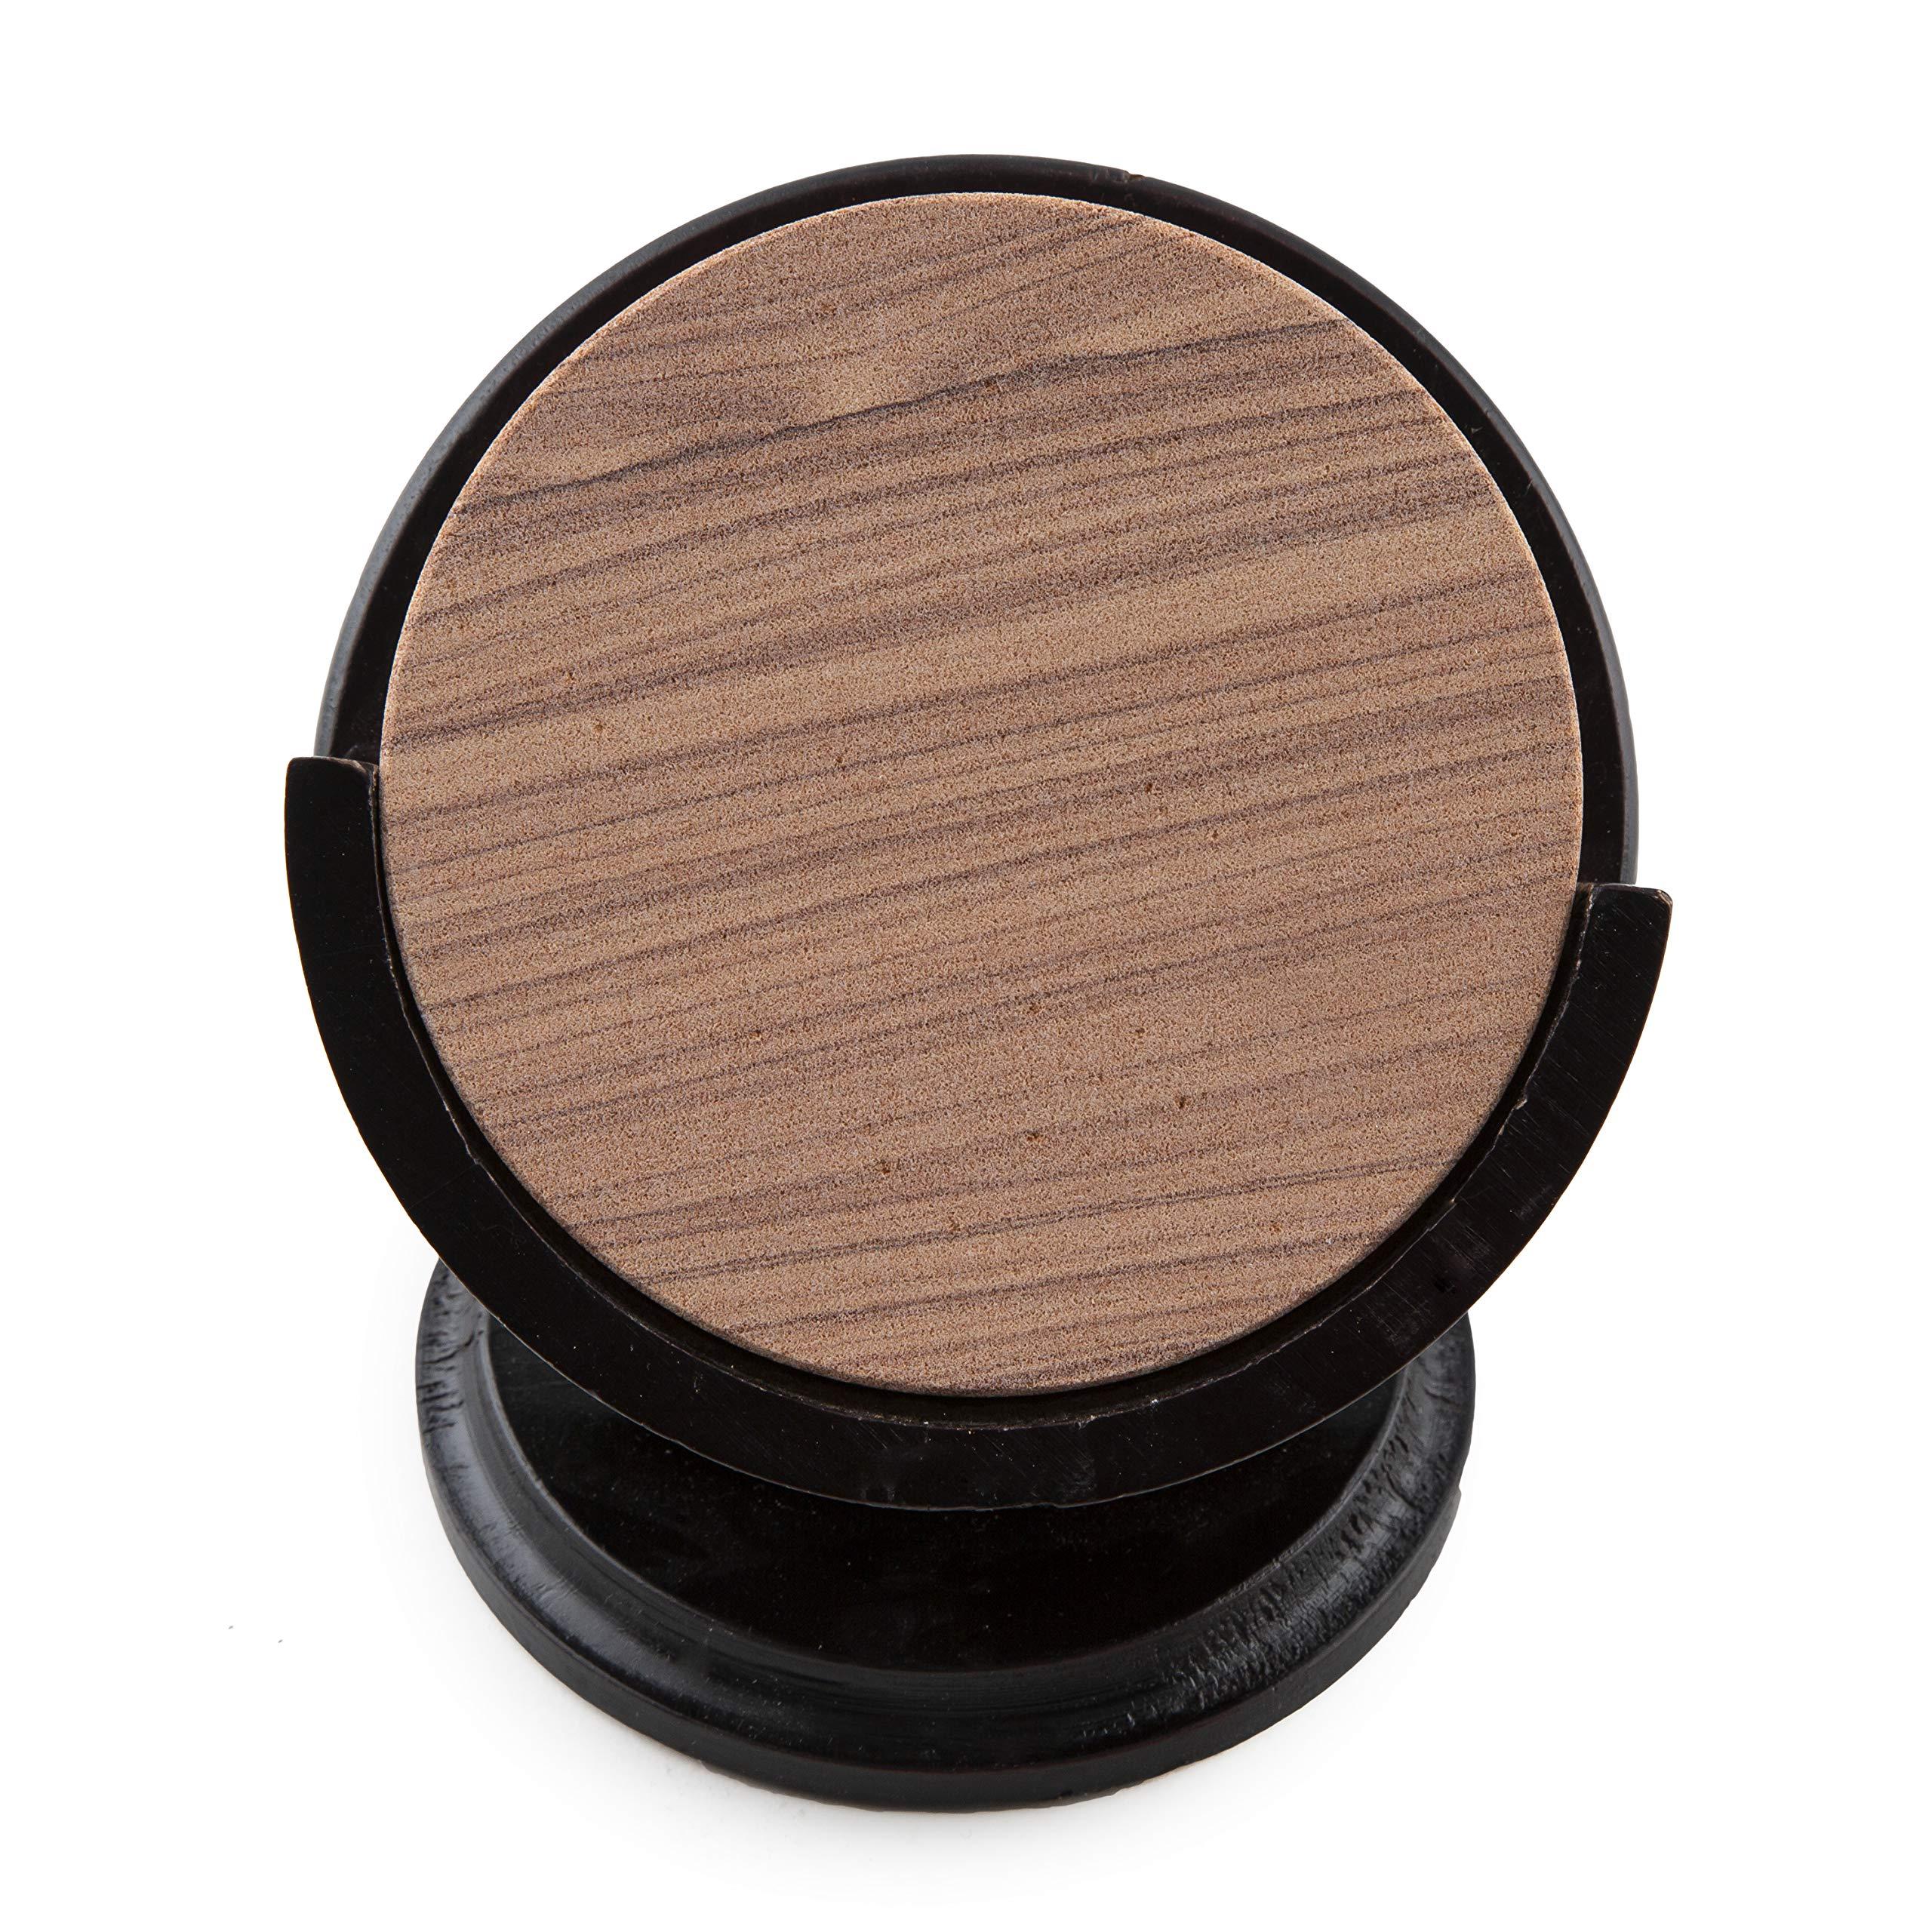 Thirstystone TS6-H13 Sandstone Wood Coaster and Holder, 4 inch round, Cinnabar w/Pedestal Hldr